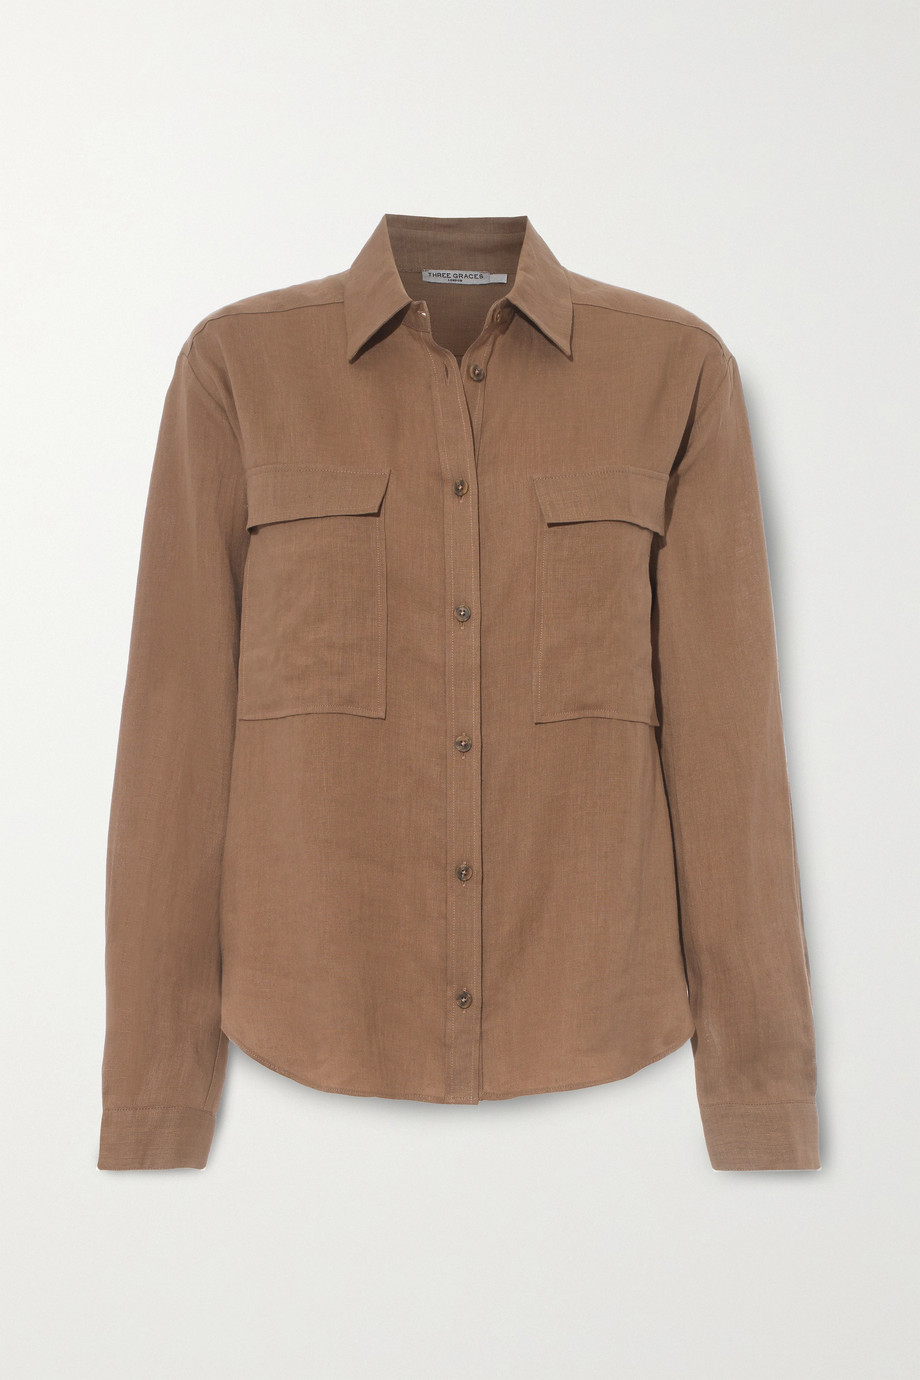 Three Graces London Willow linen shirt